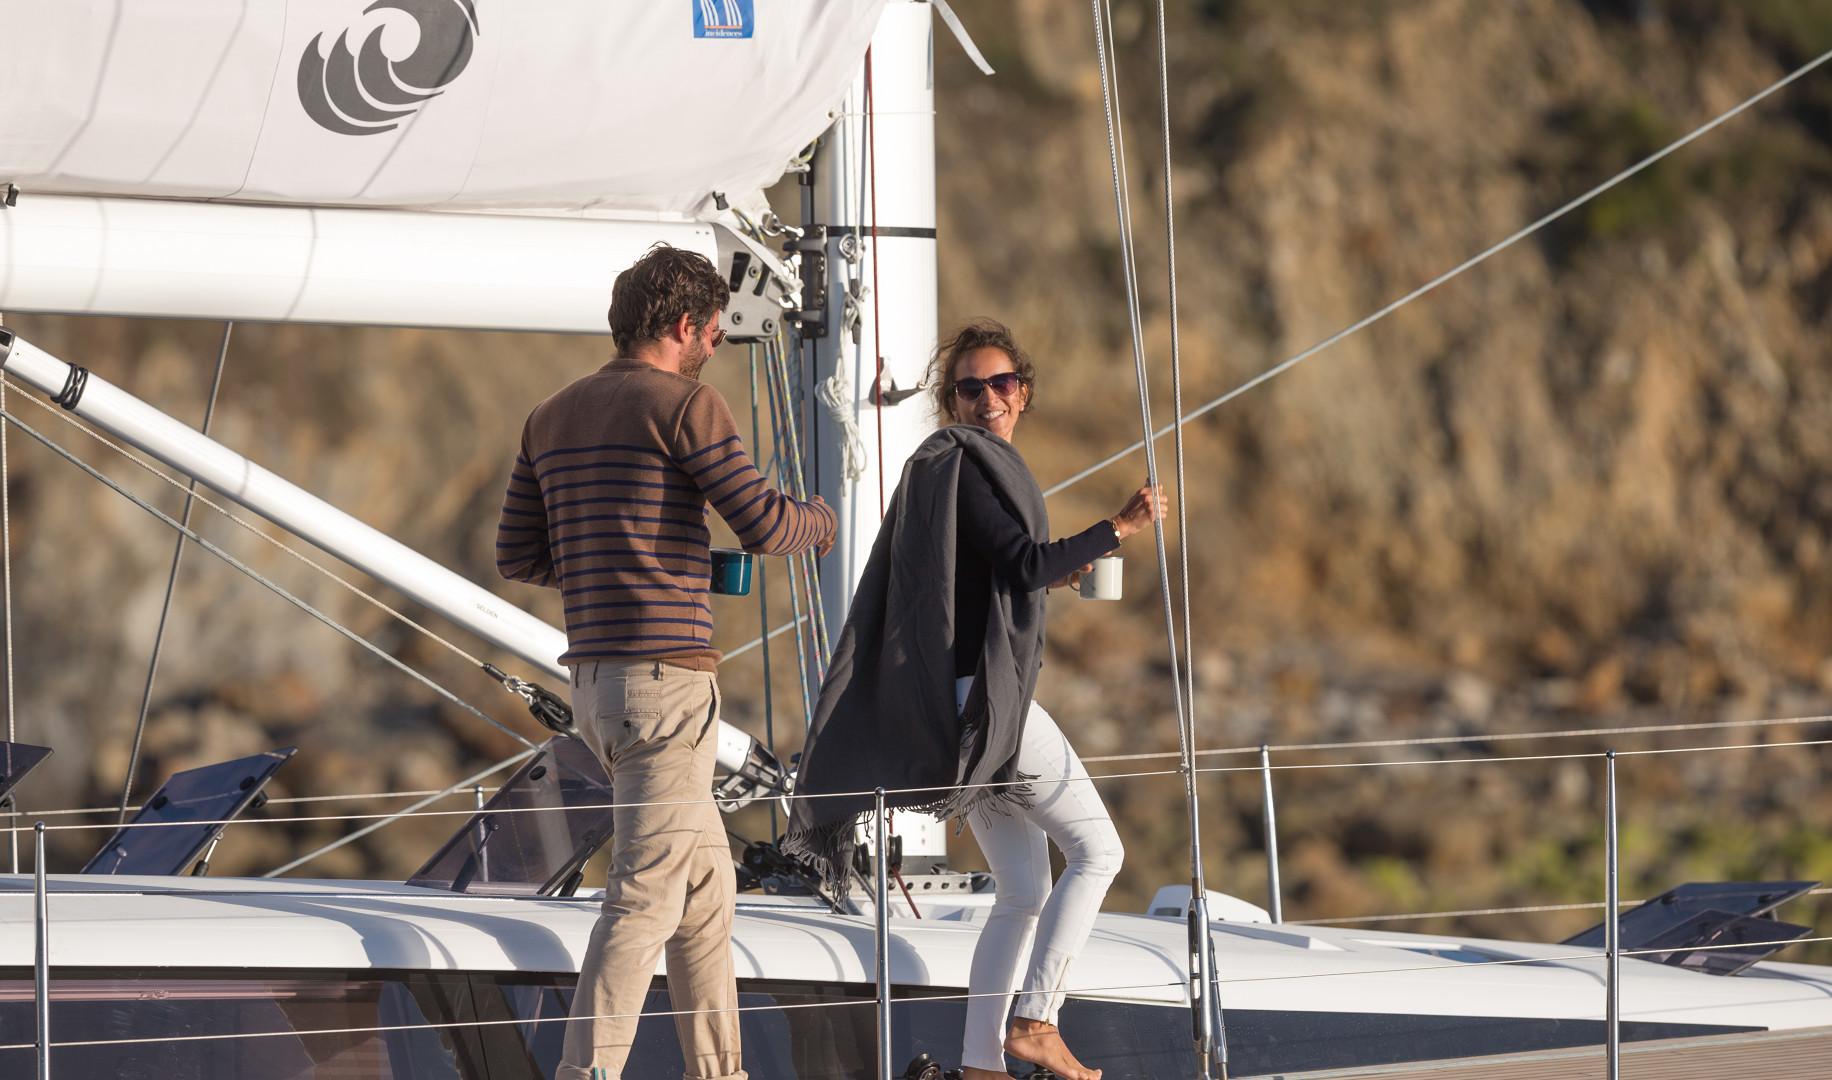 Sense 57 Sail  boat for sale Cape Town A